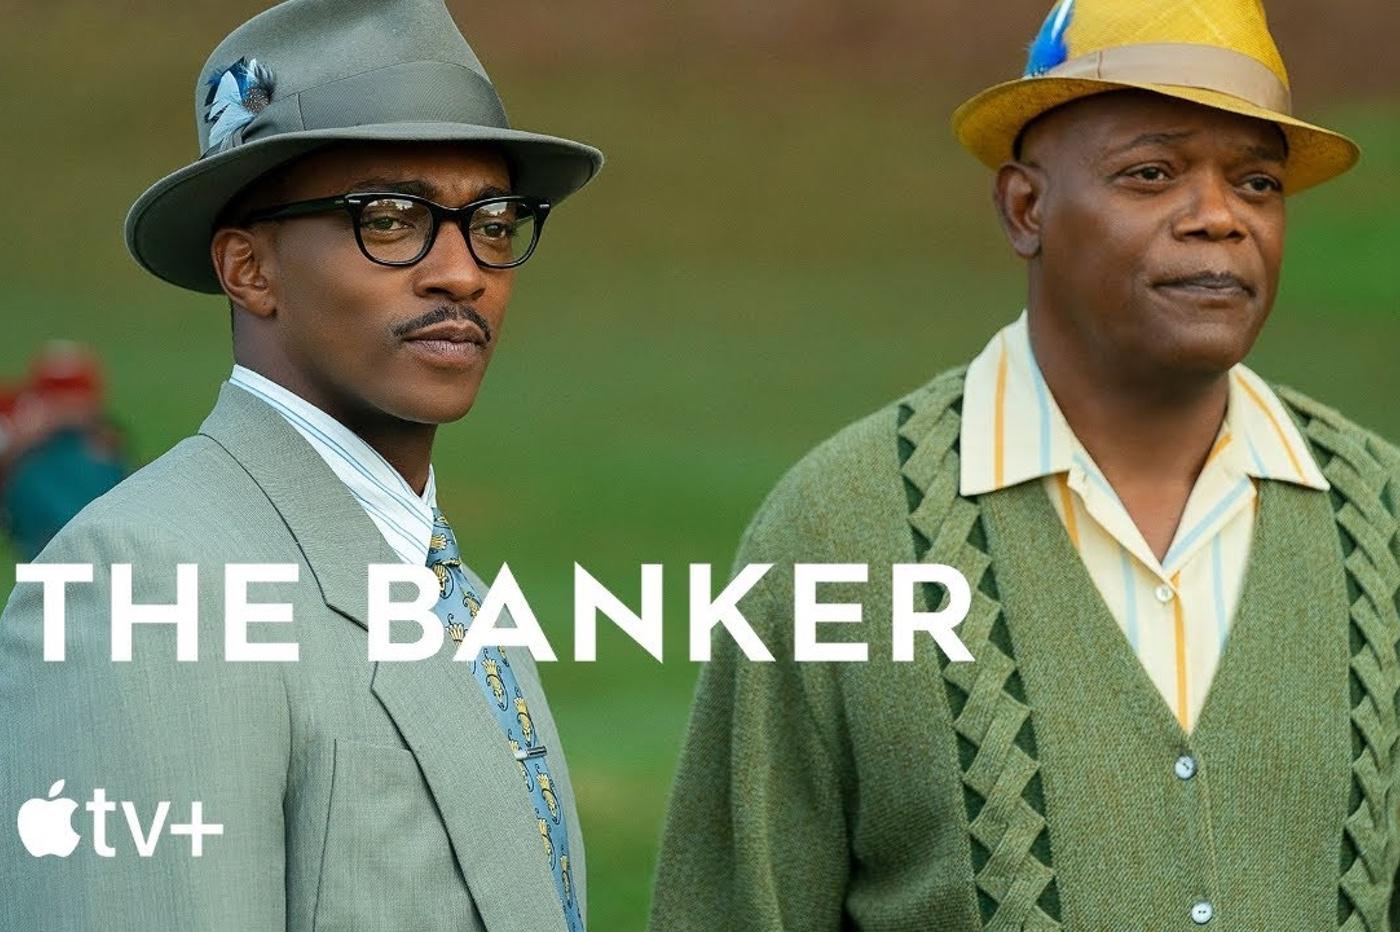 film apple The Banker